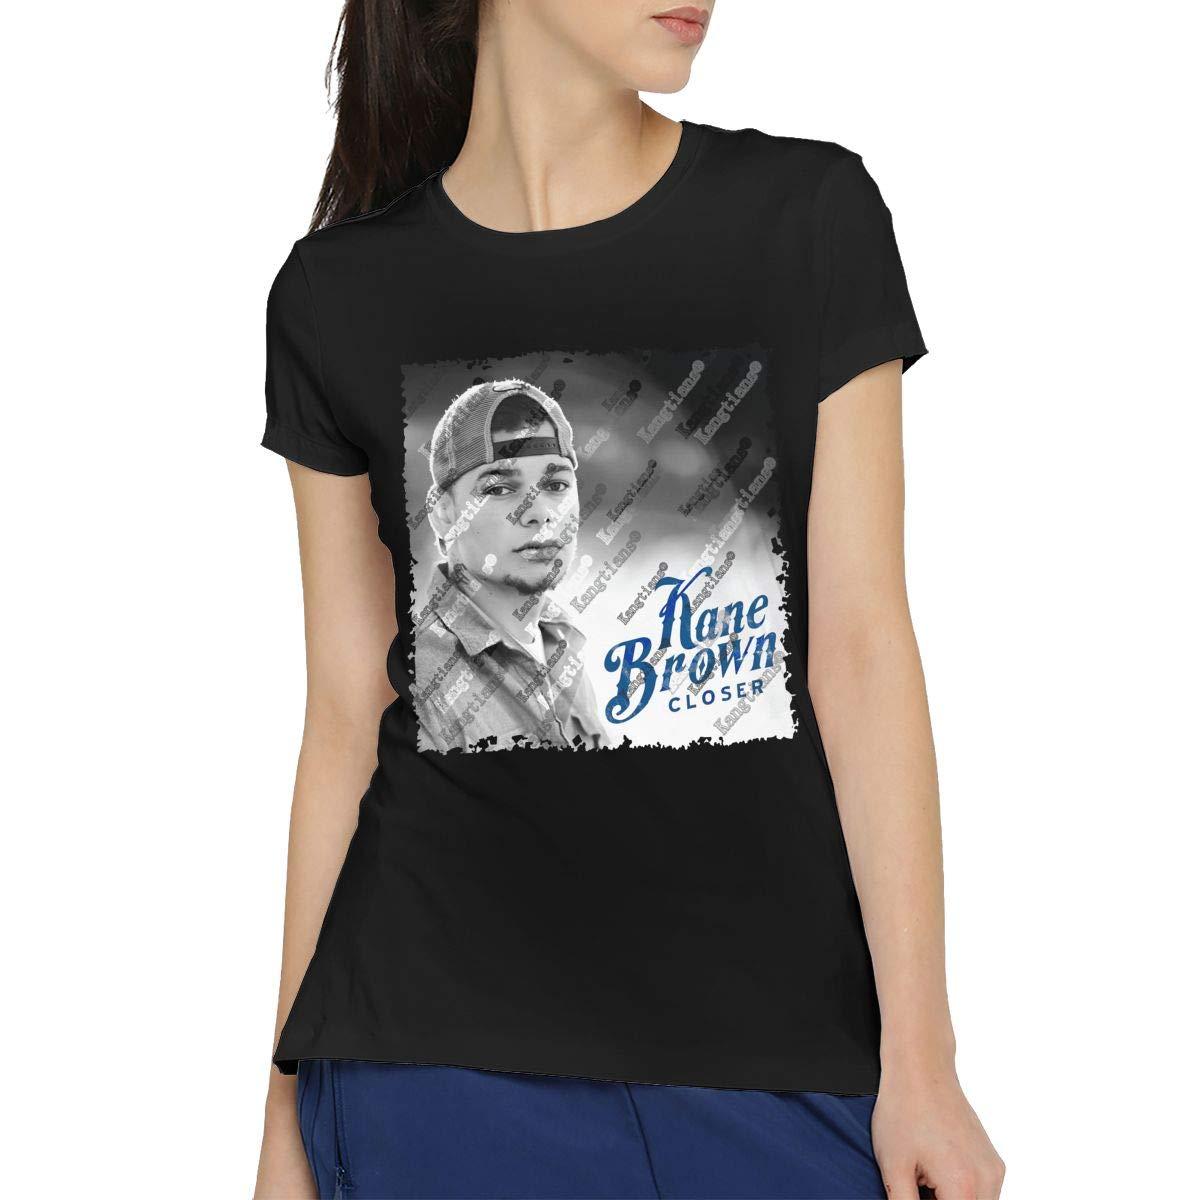 Urahara Kane Brown Closer Short Sleeve Funny T Shirt Tees 1906